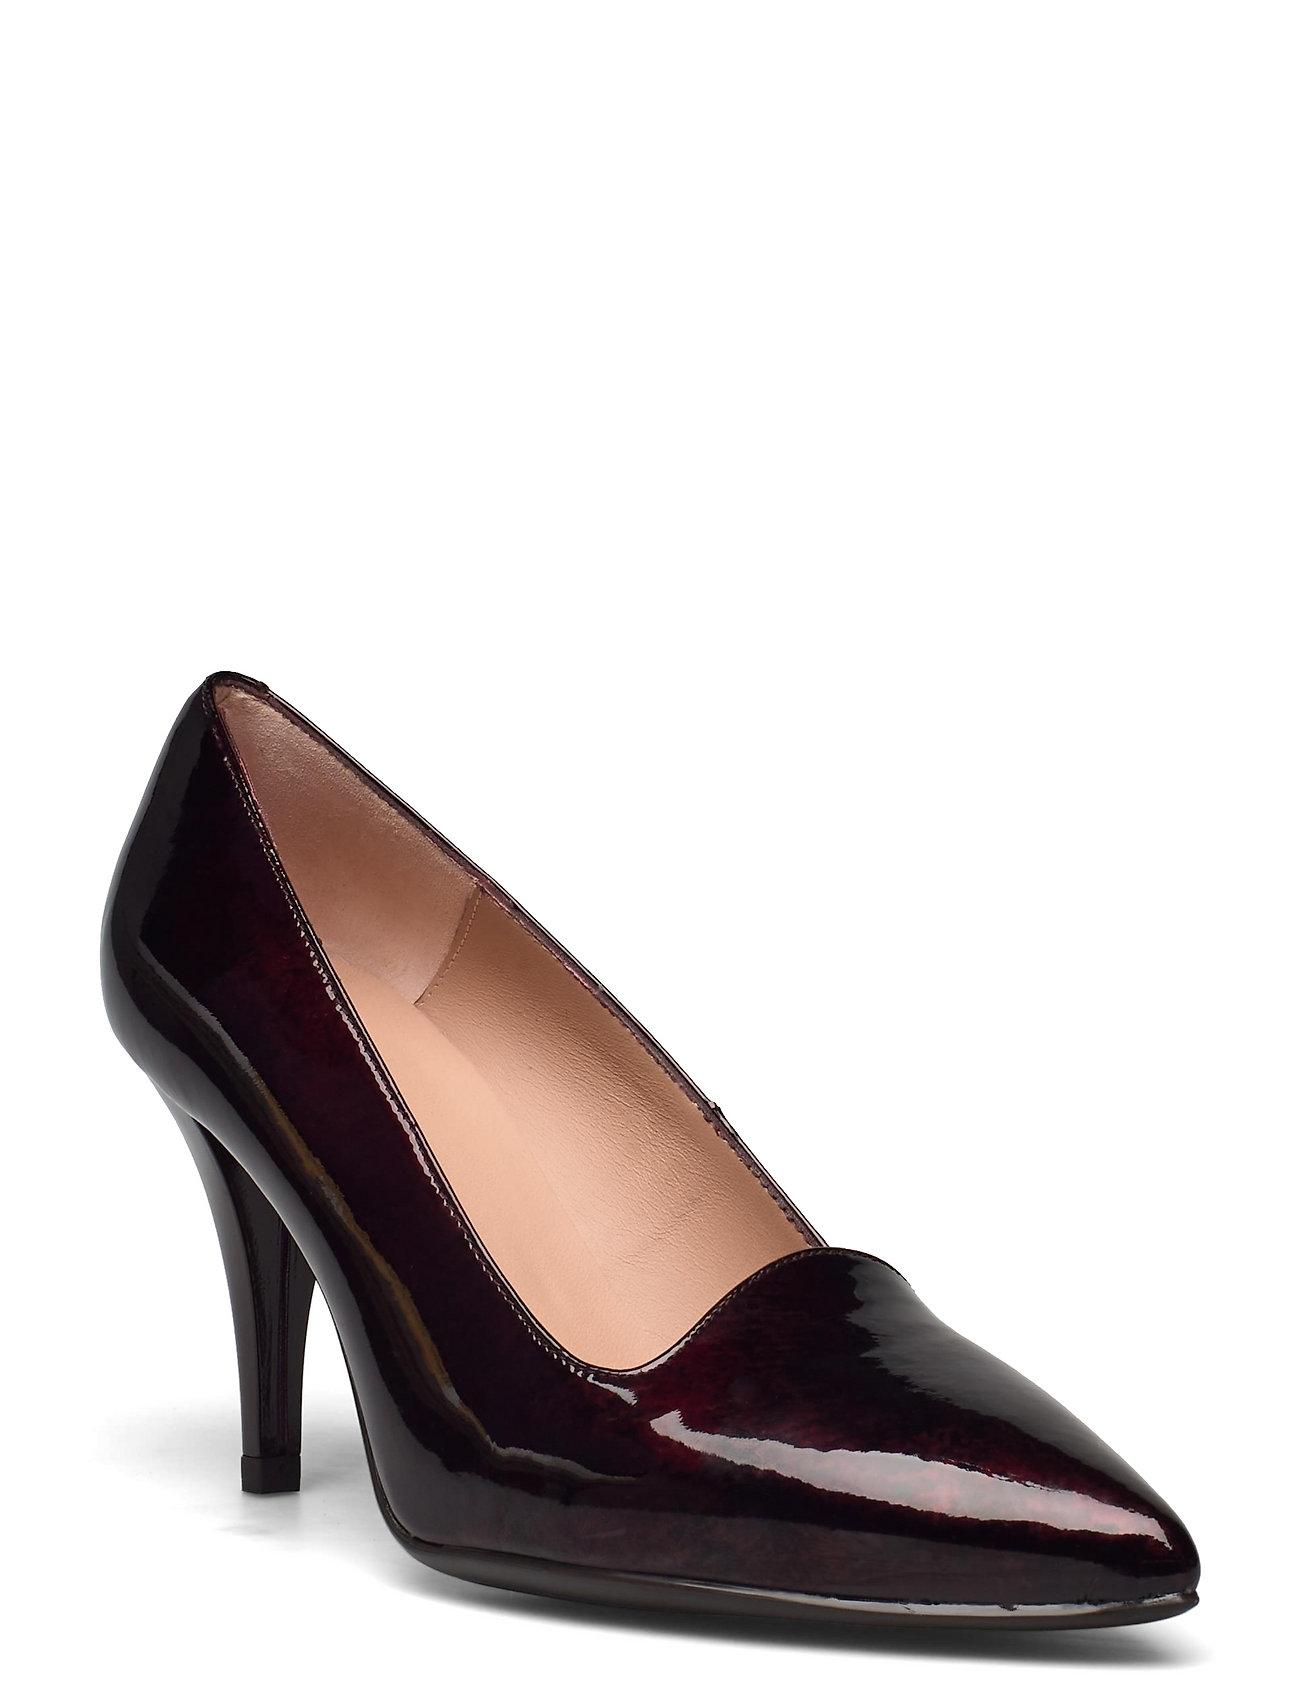 Tipua_pru Shoes Heels Pumps Classic Sort UNISA